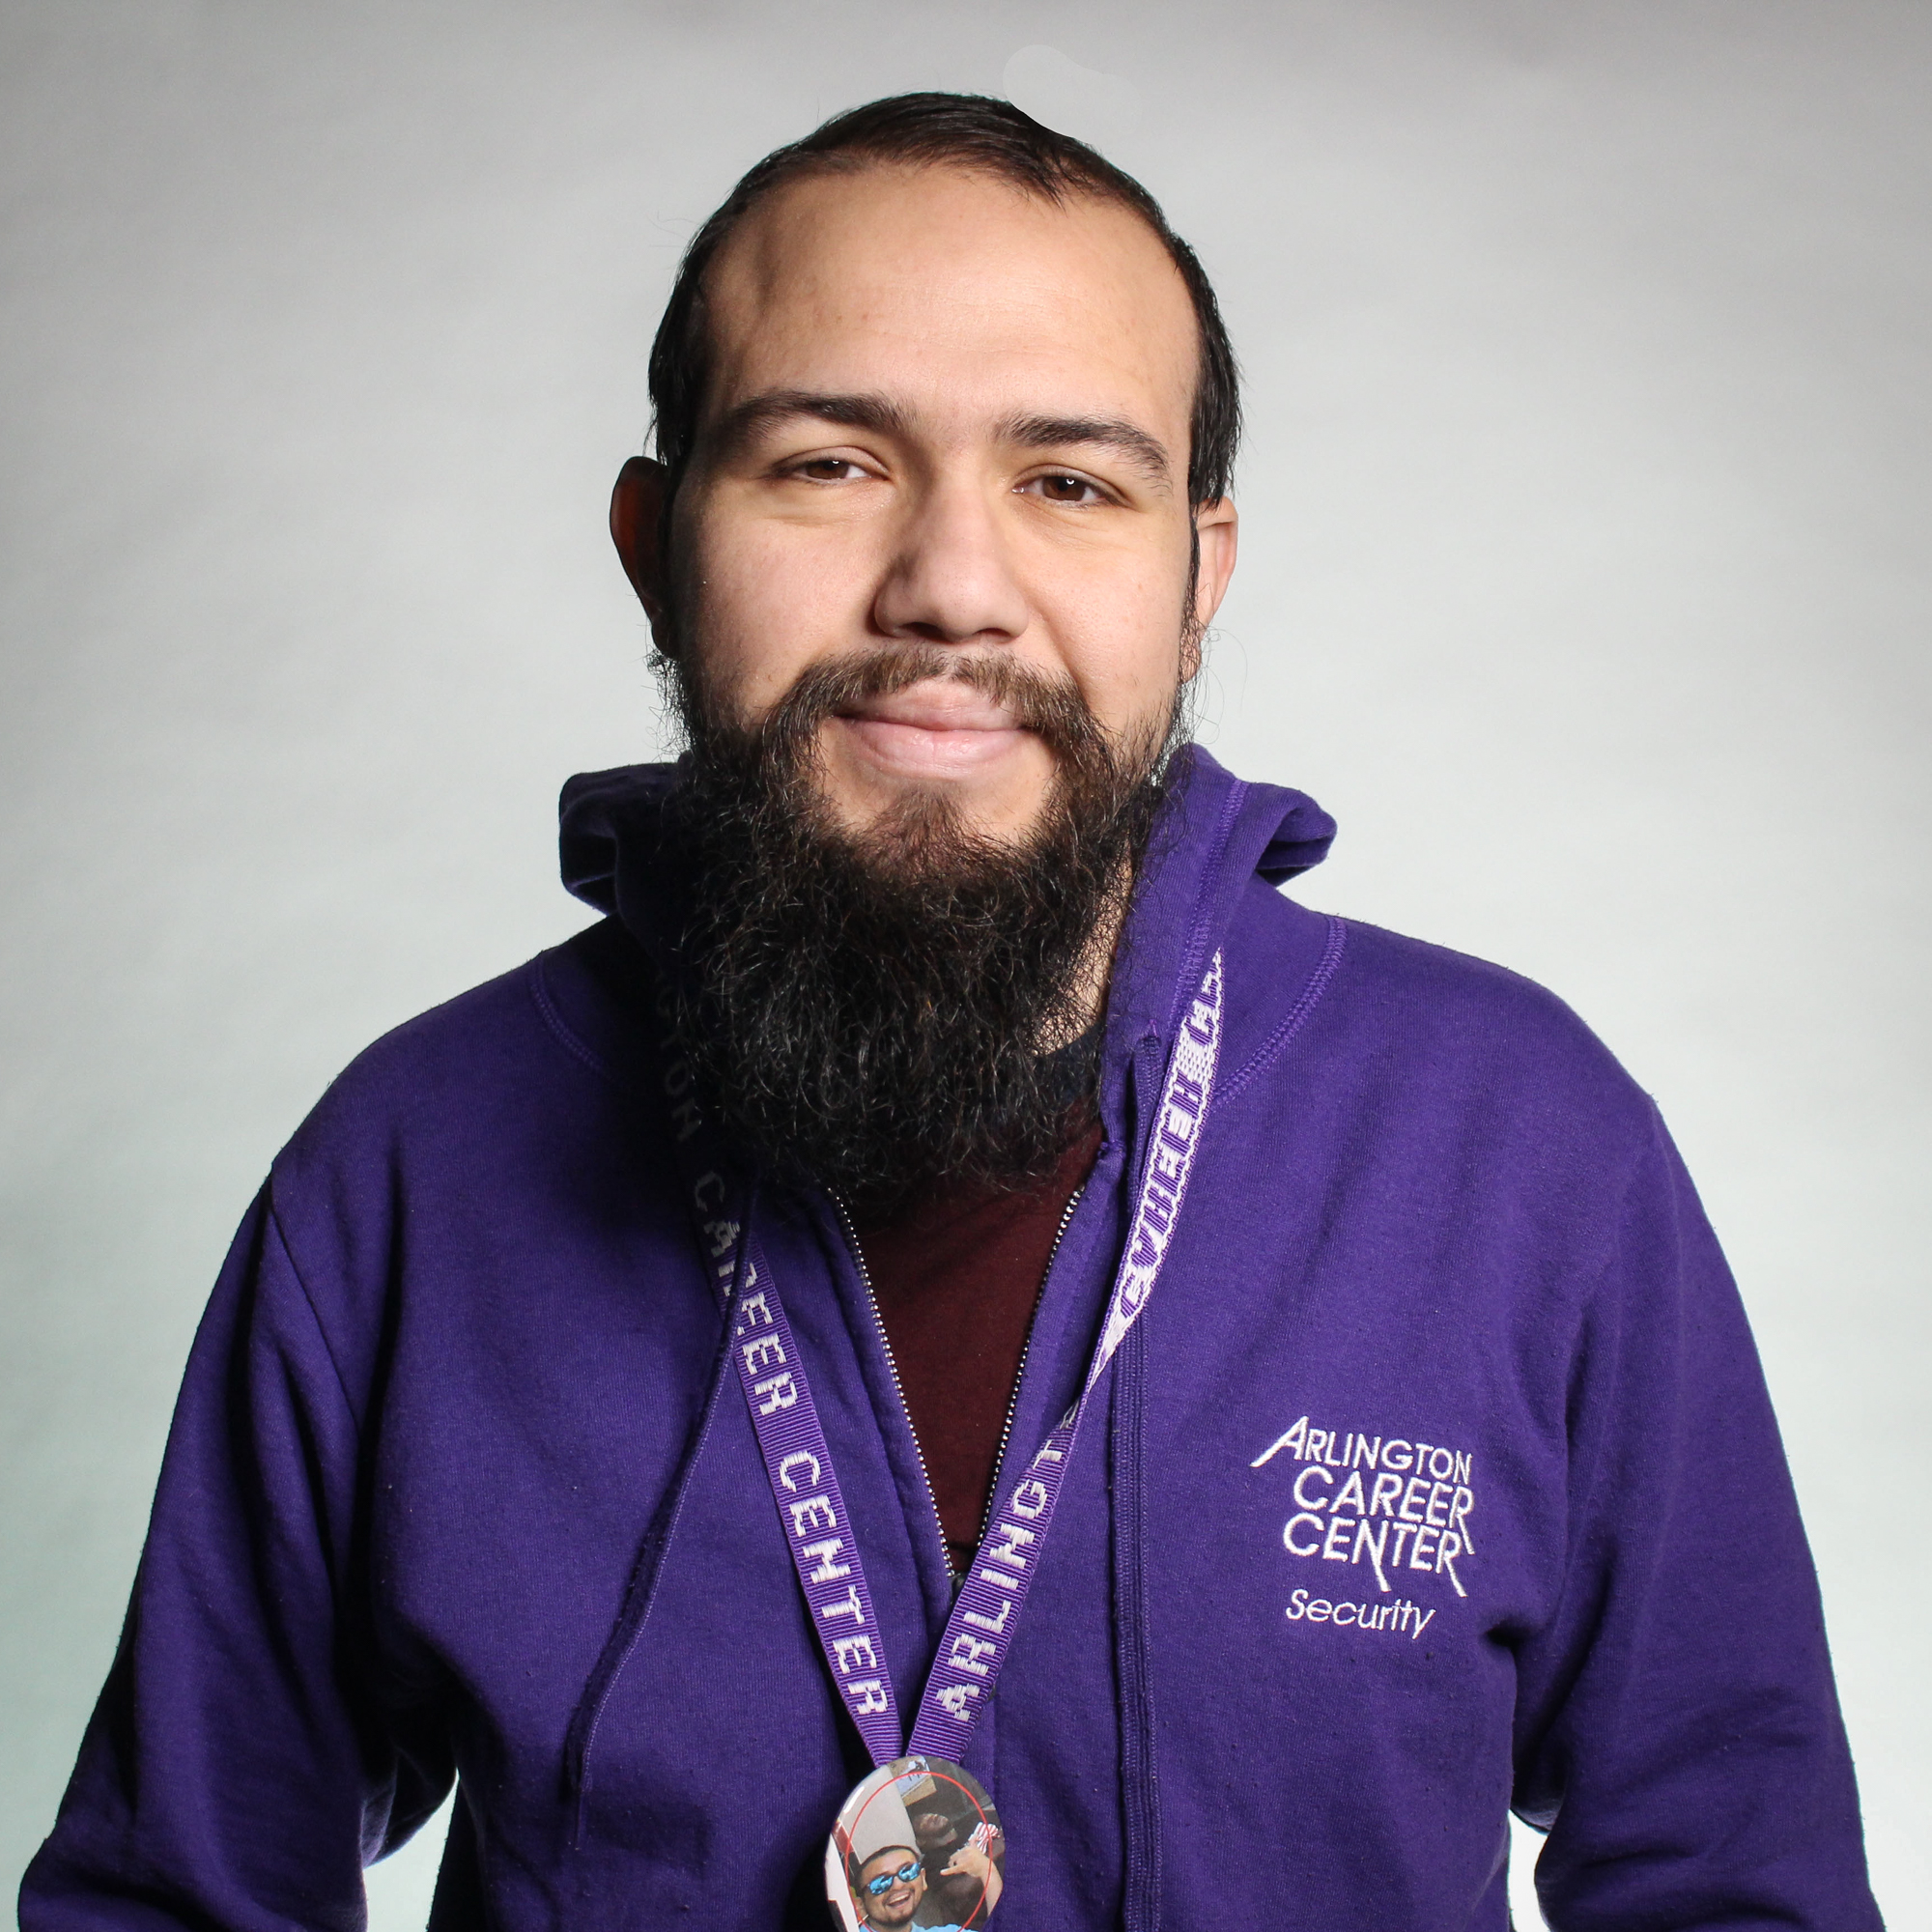 Mr. Eddy Reyes